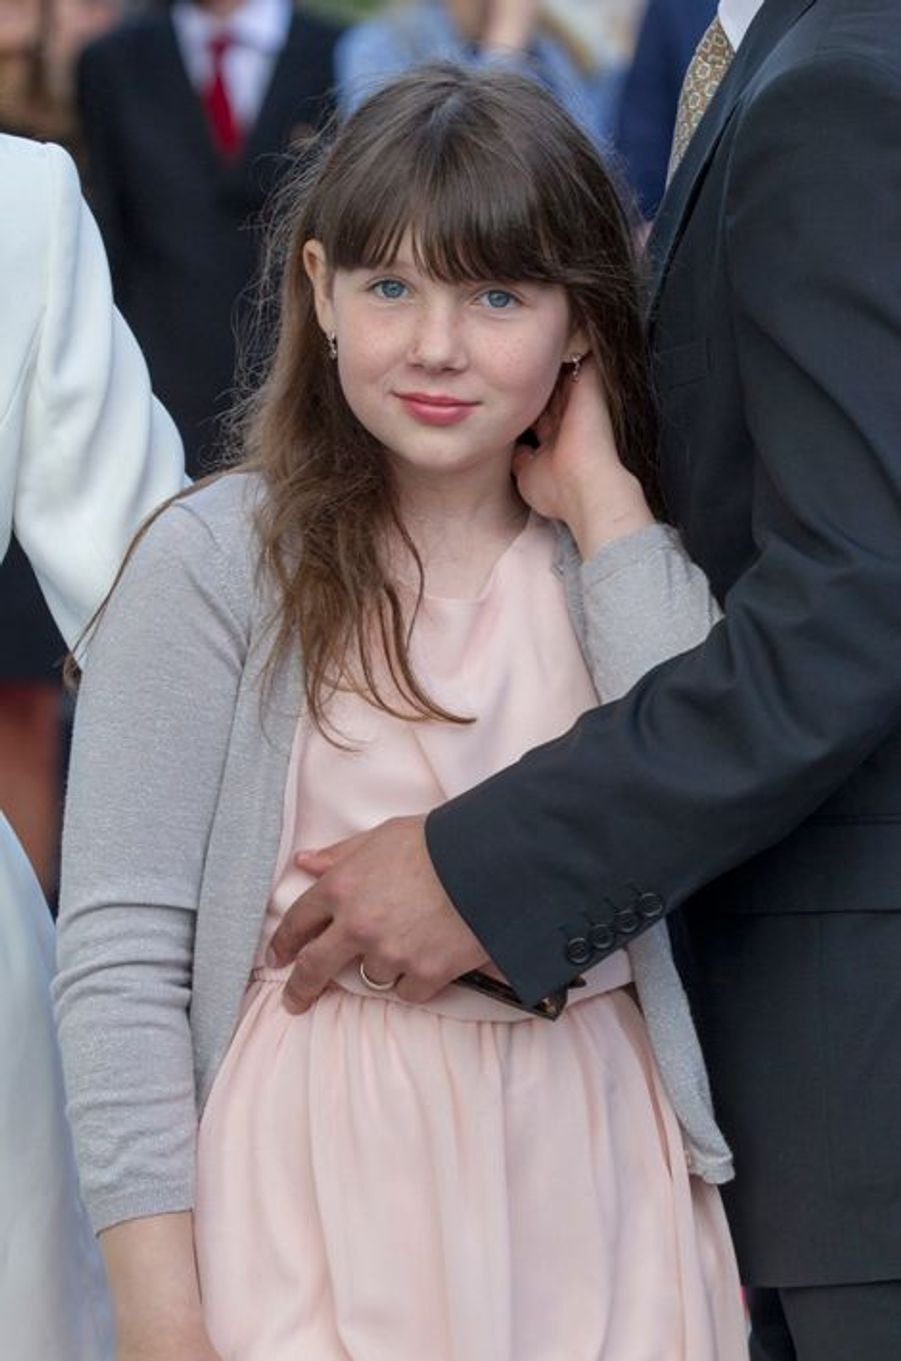 Maud-Angelica, fille aînée de la princesse Martha-Louise de Norvège, à Oslo le 7 juin 2015